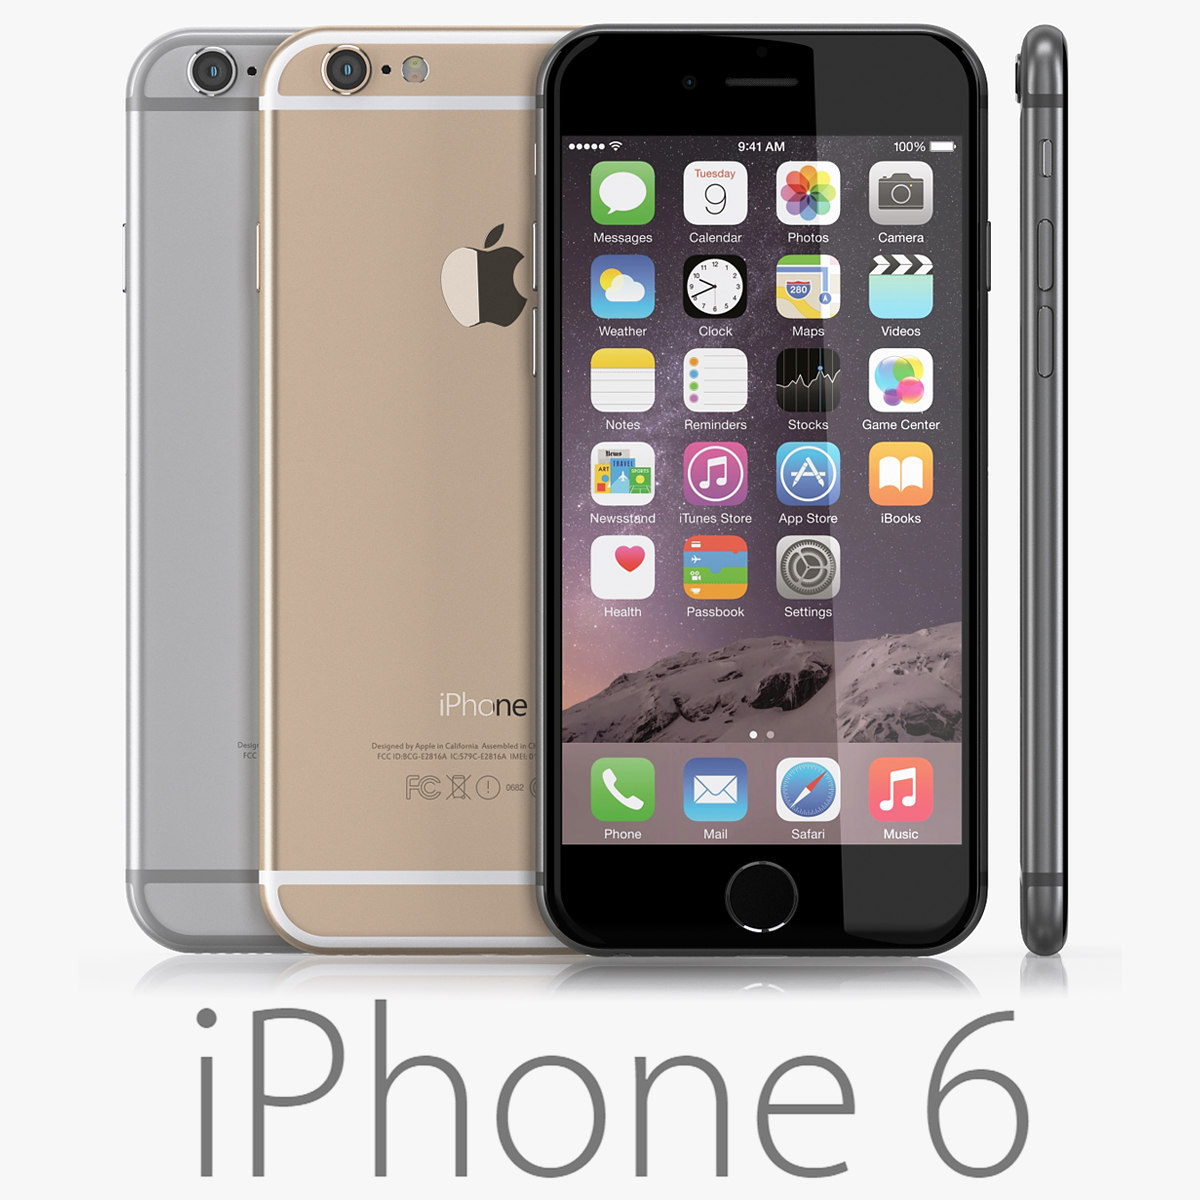 iPhone_6_all_00.jpg